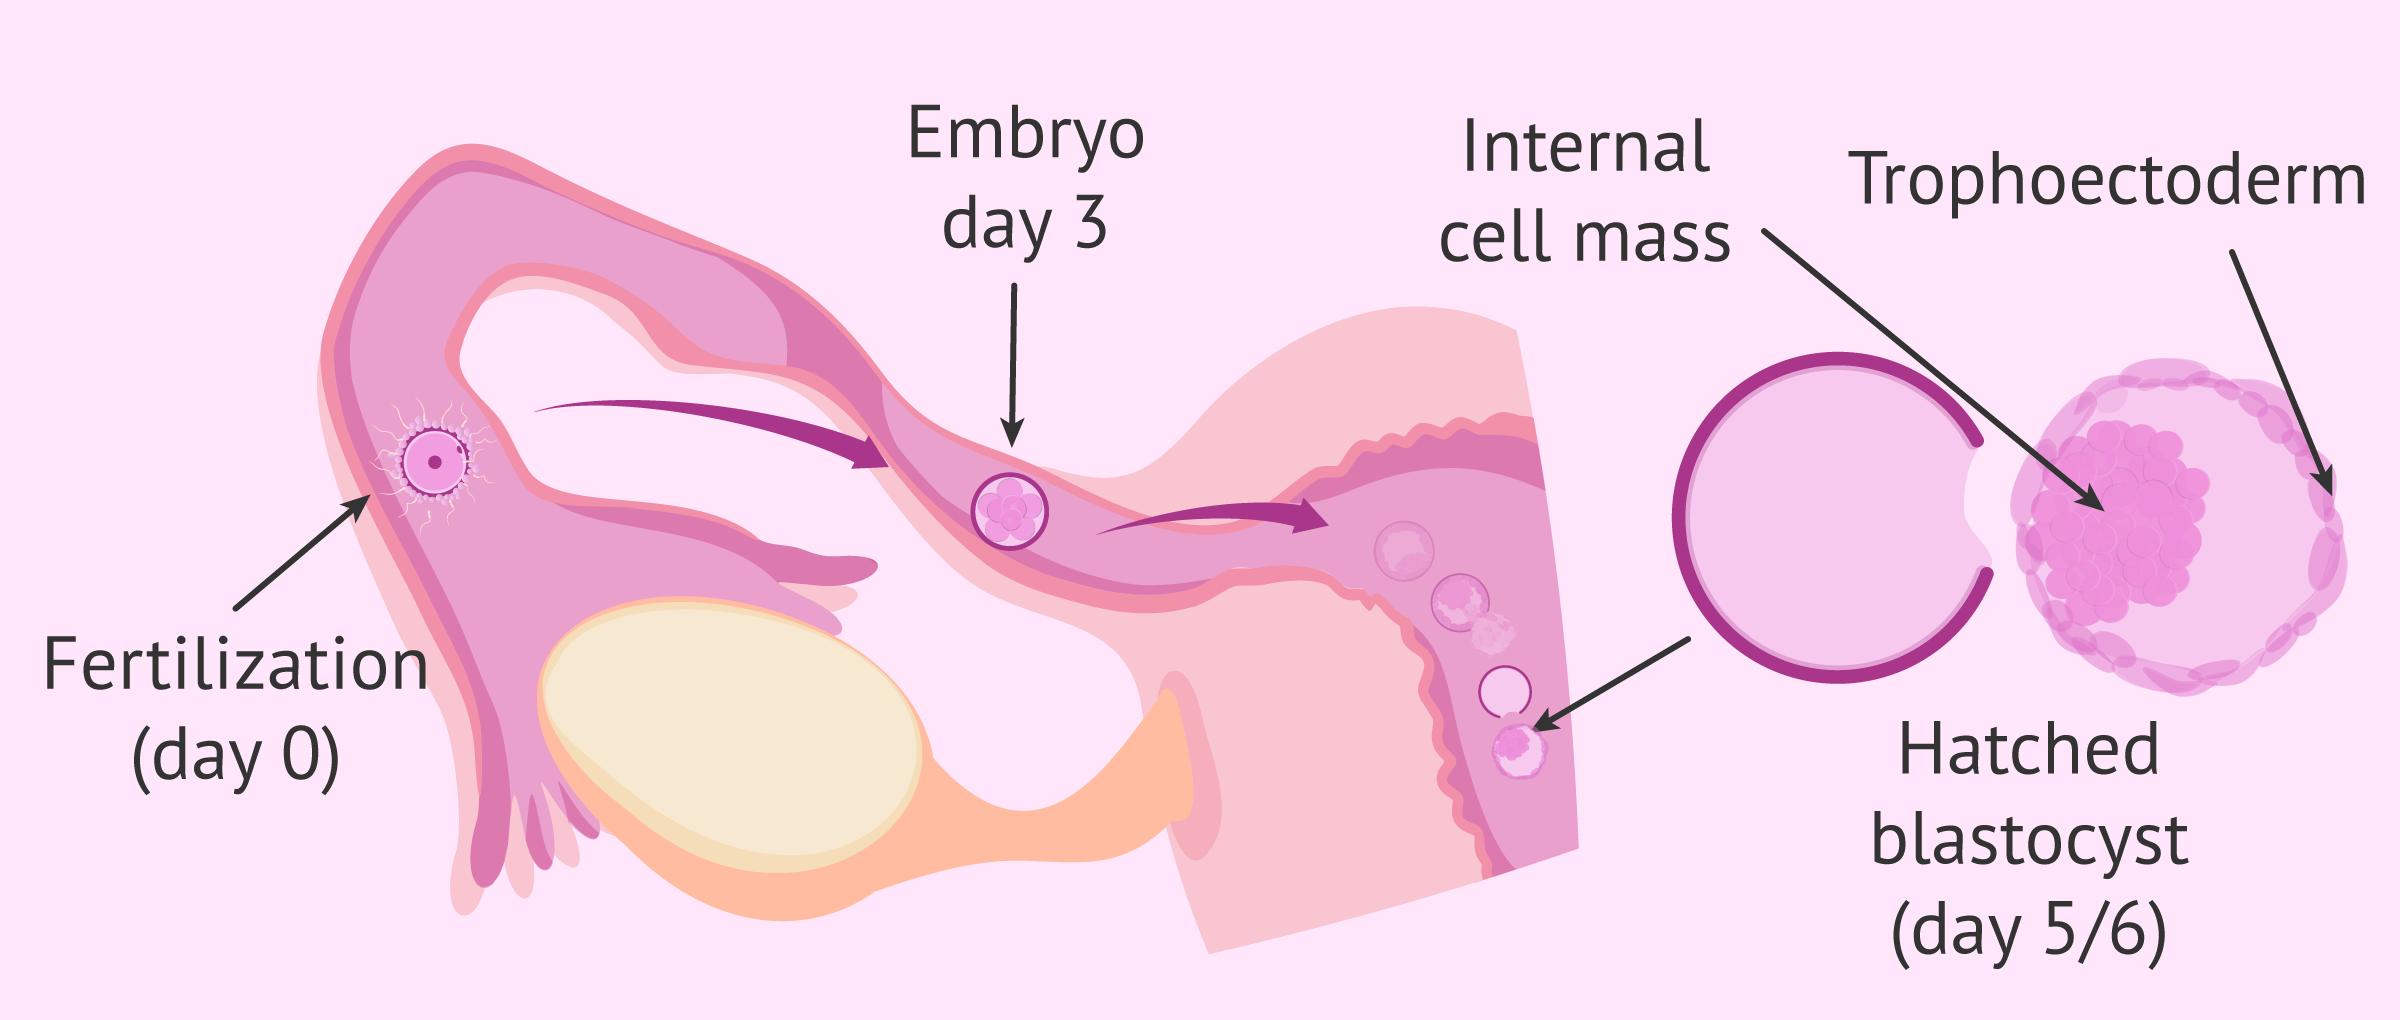 Imagen: Development and implantation of embryo in the uterus